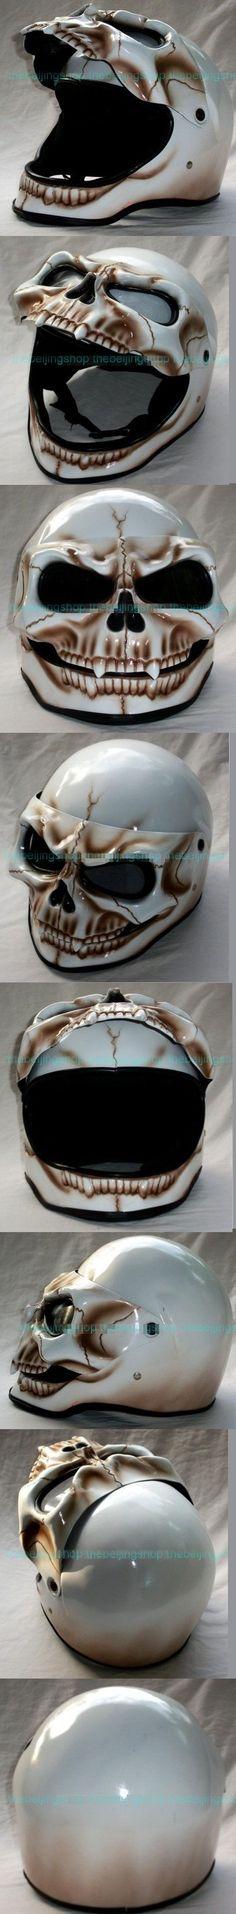 Flip up Face Shield Skeleton Full face Motorcycle Helmet - Diana`s Custom Design K, that's pretty cool!